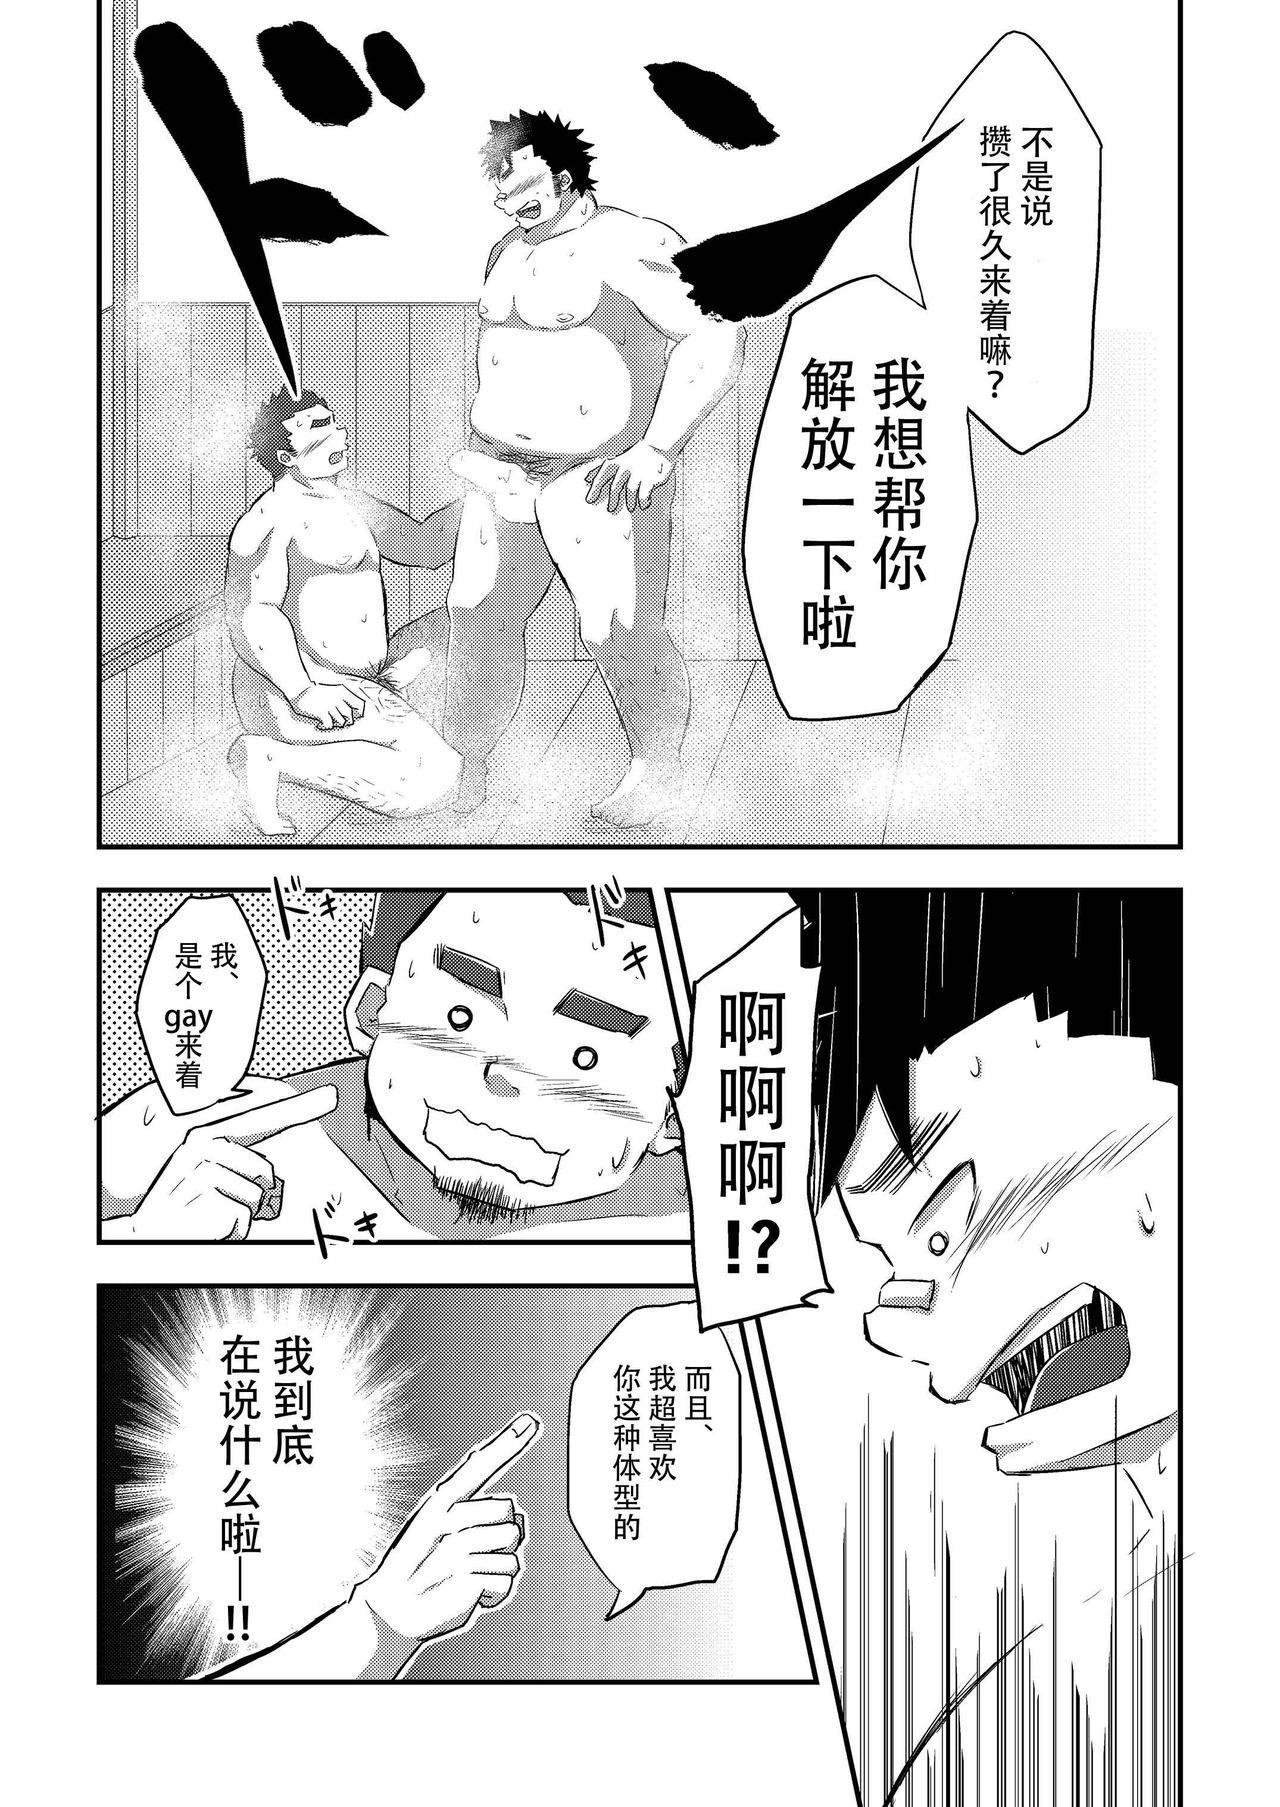 [CorkBOX (ngng)] Ise-kun wa Tamatte Iru. - Ise-kun is horny. [Chinese] {日曜日汉化} [Digital] 13